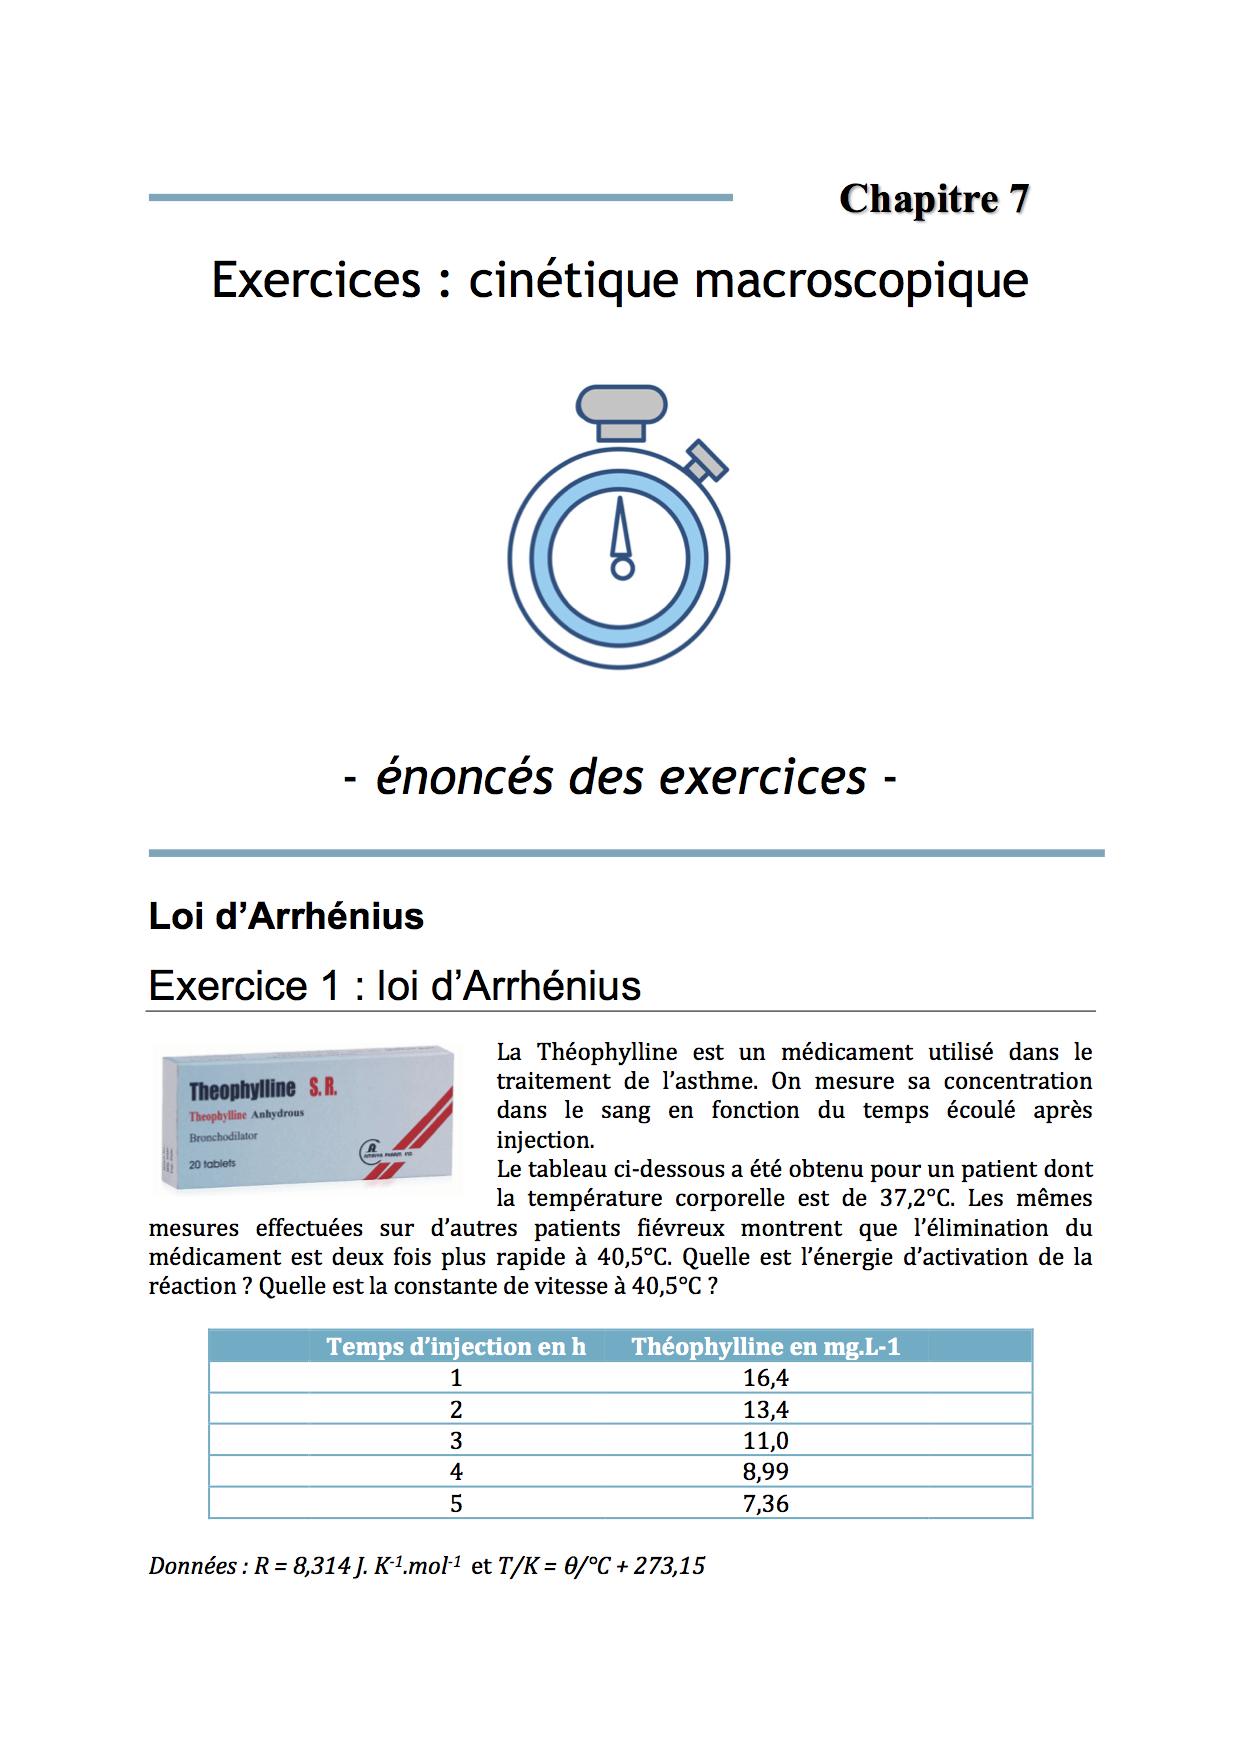 TD_chapitre7_enonce